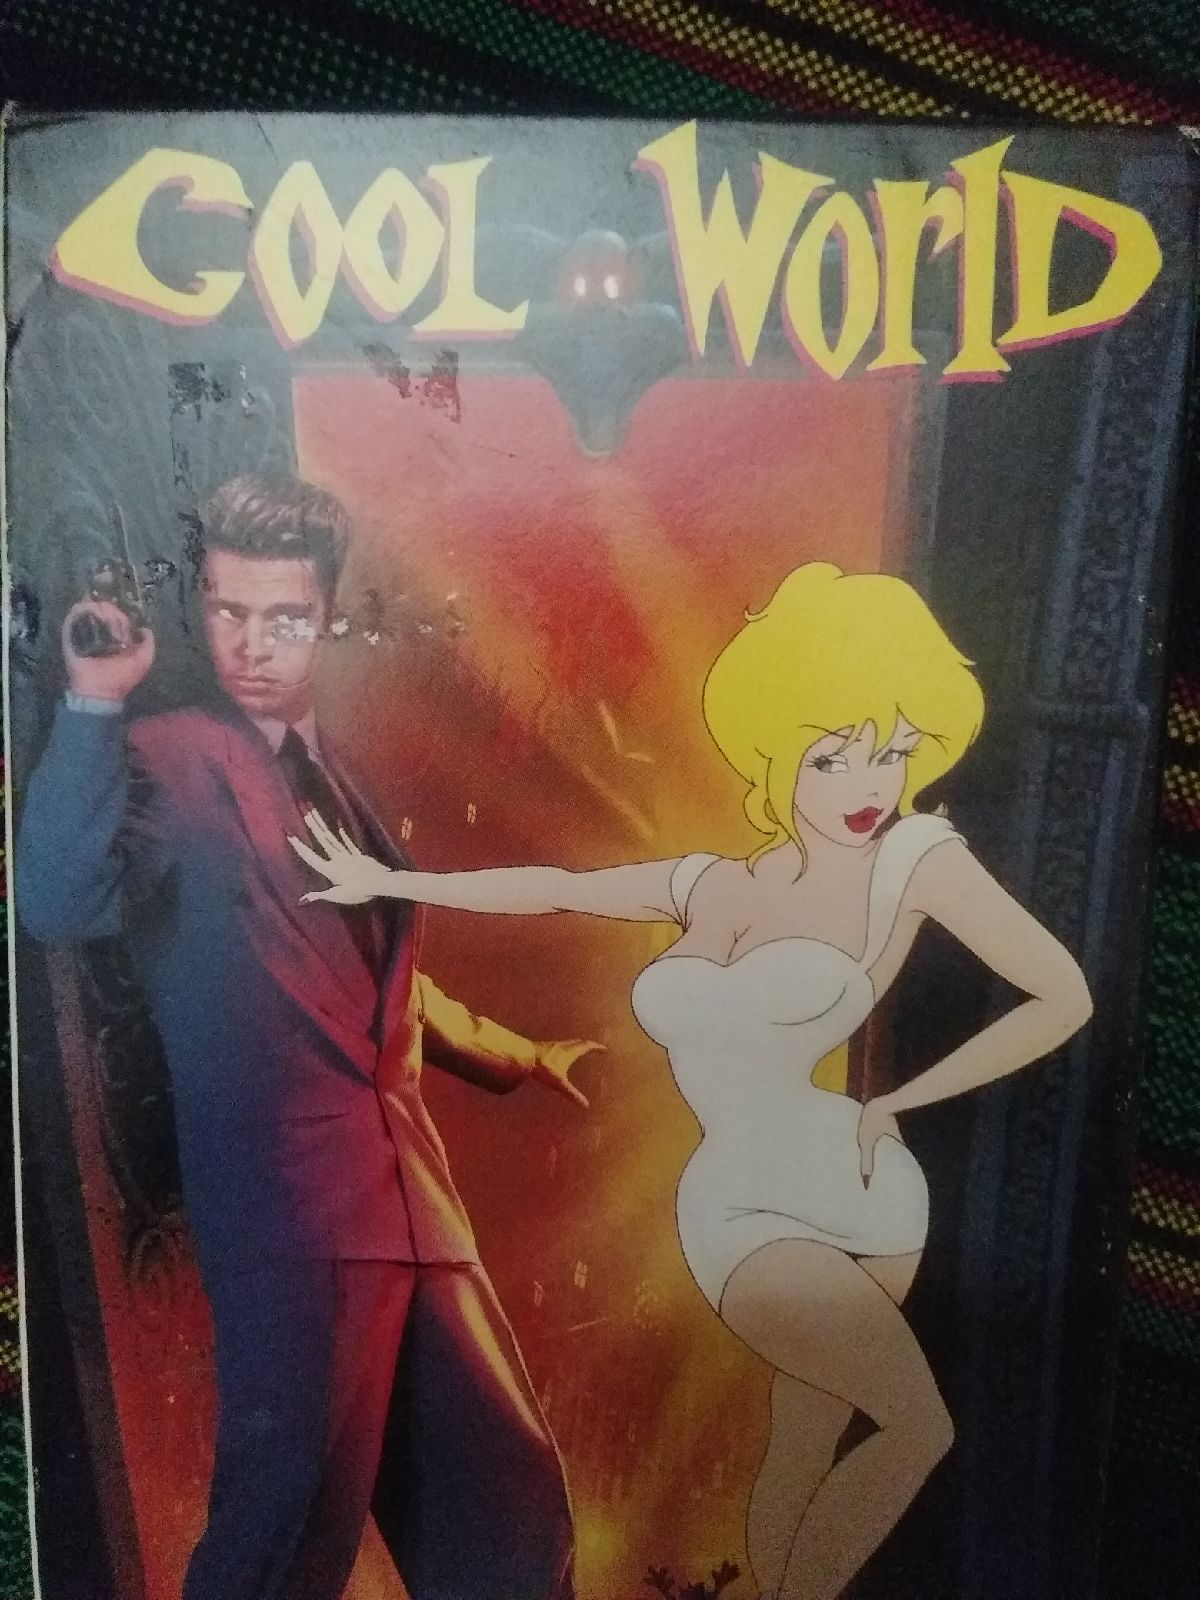 COOL WORLD - VHS movie Rare 1992 Brad Pi